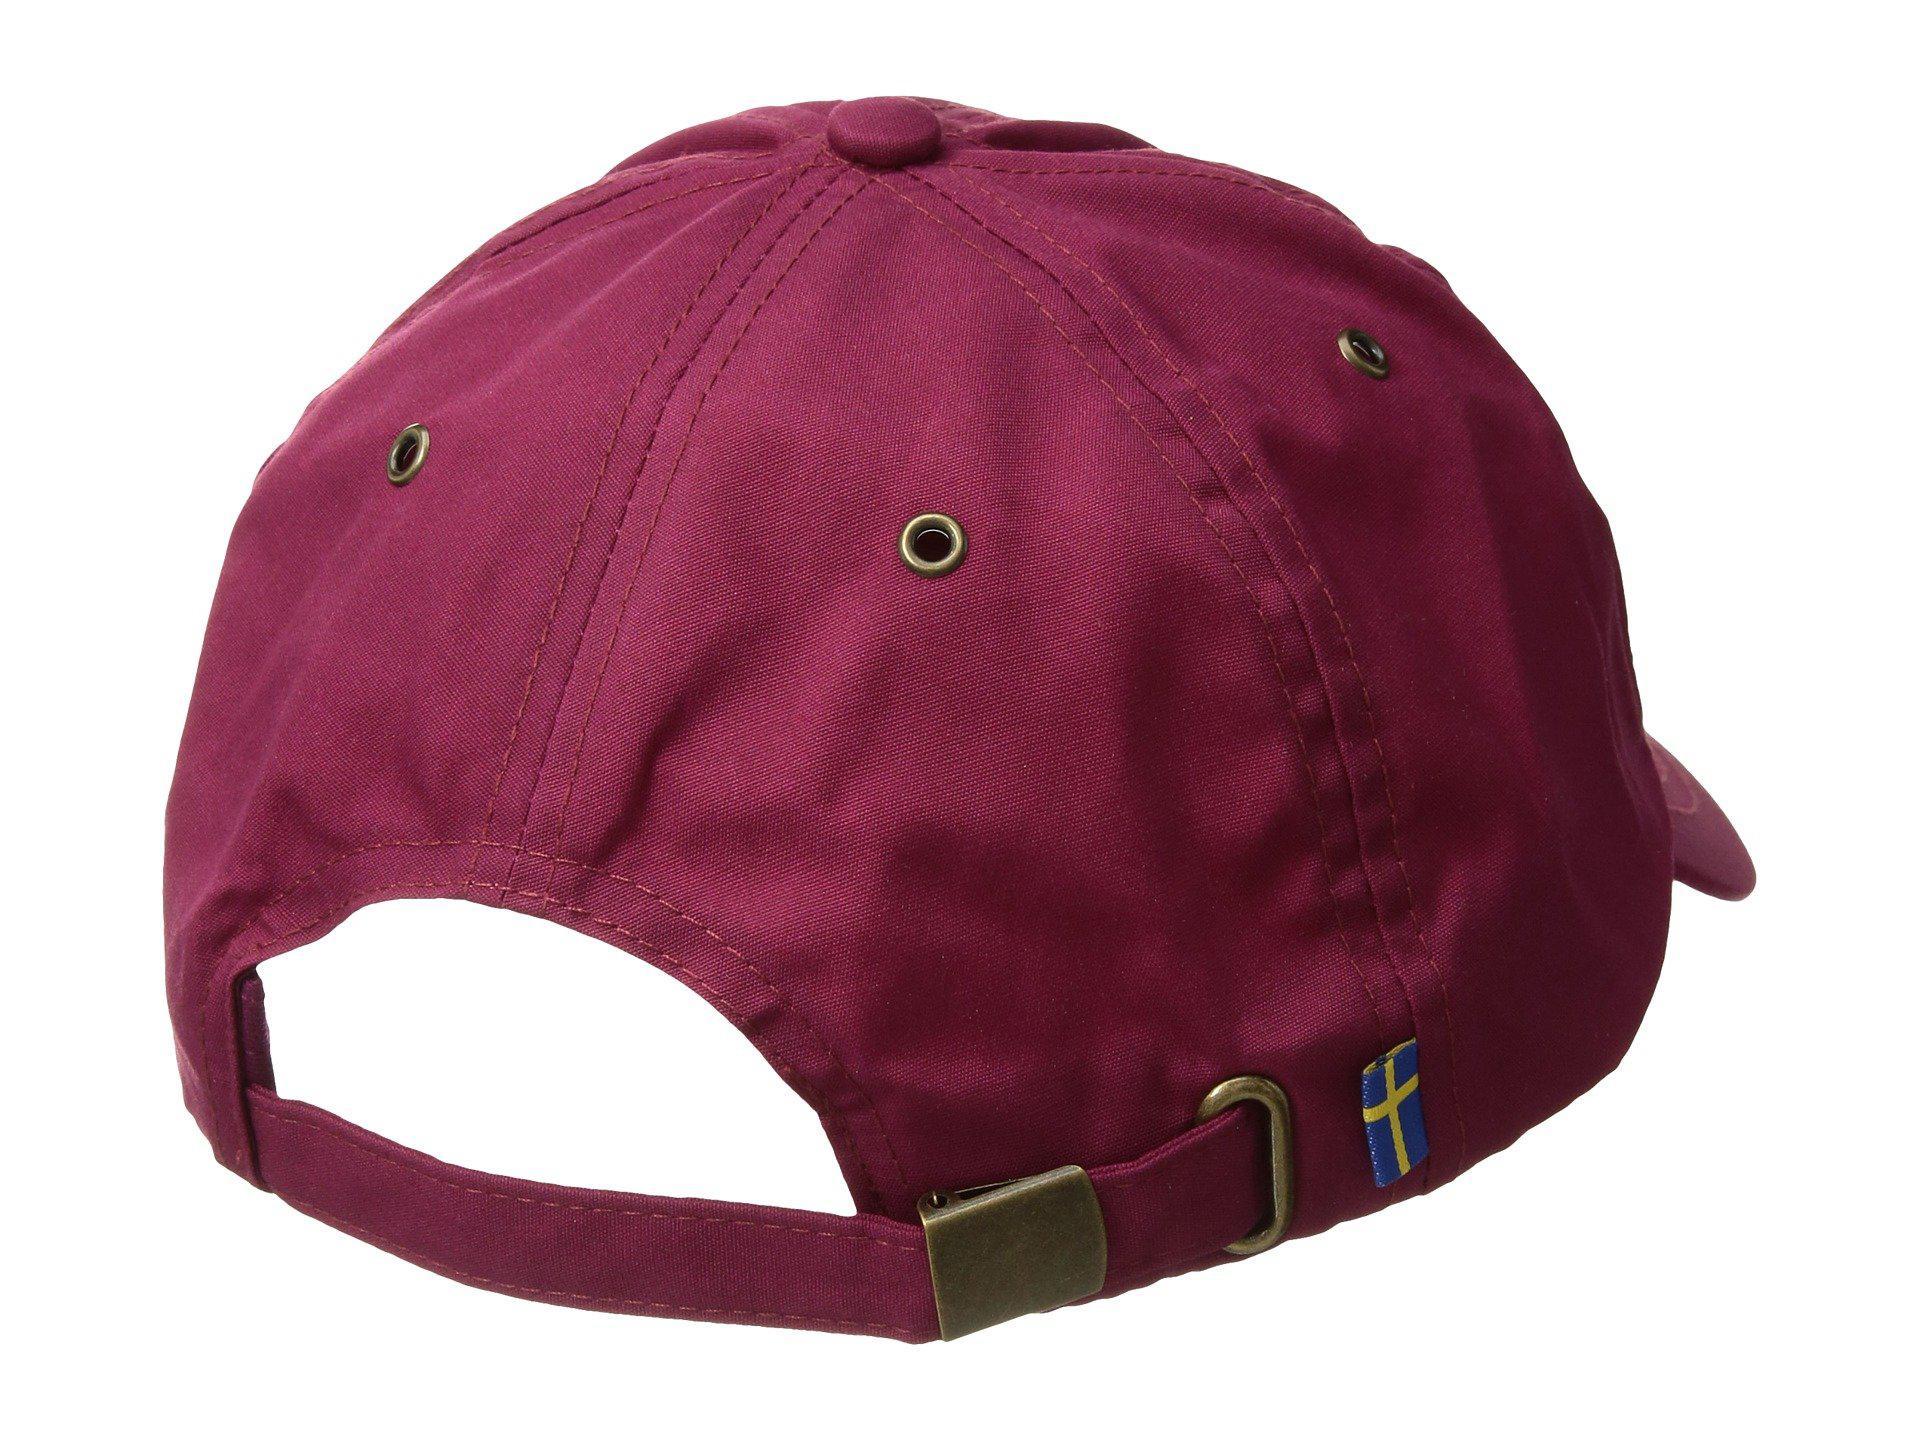 5fdd8b9cef7 Lyst - Fjallraven Helags Cap (sand) Caps in Purple for Men